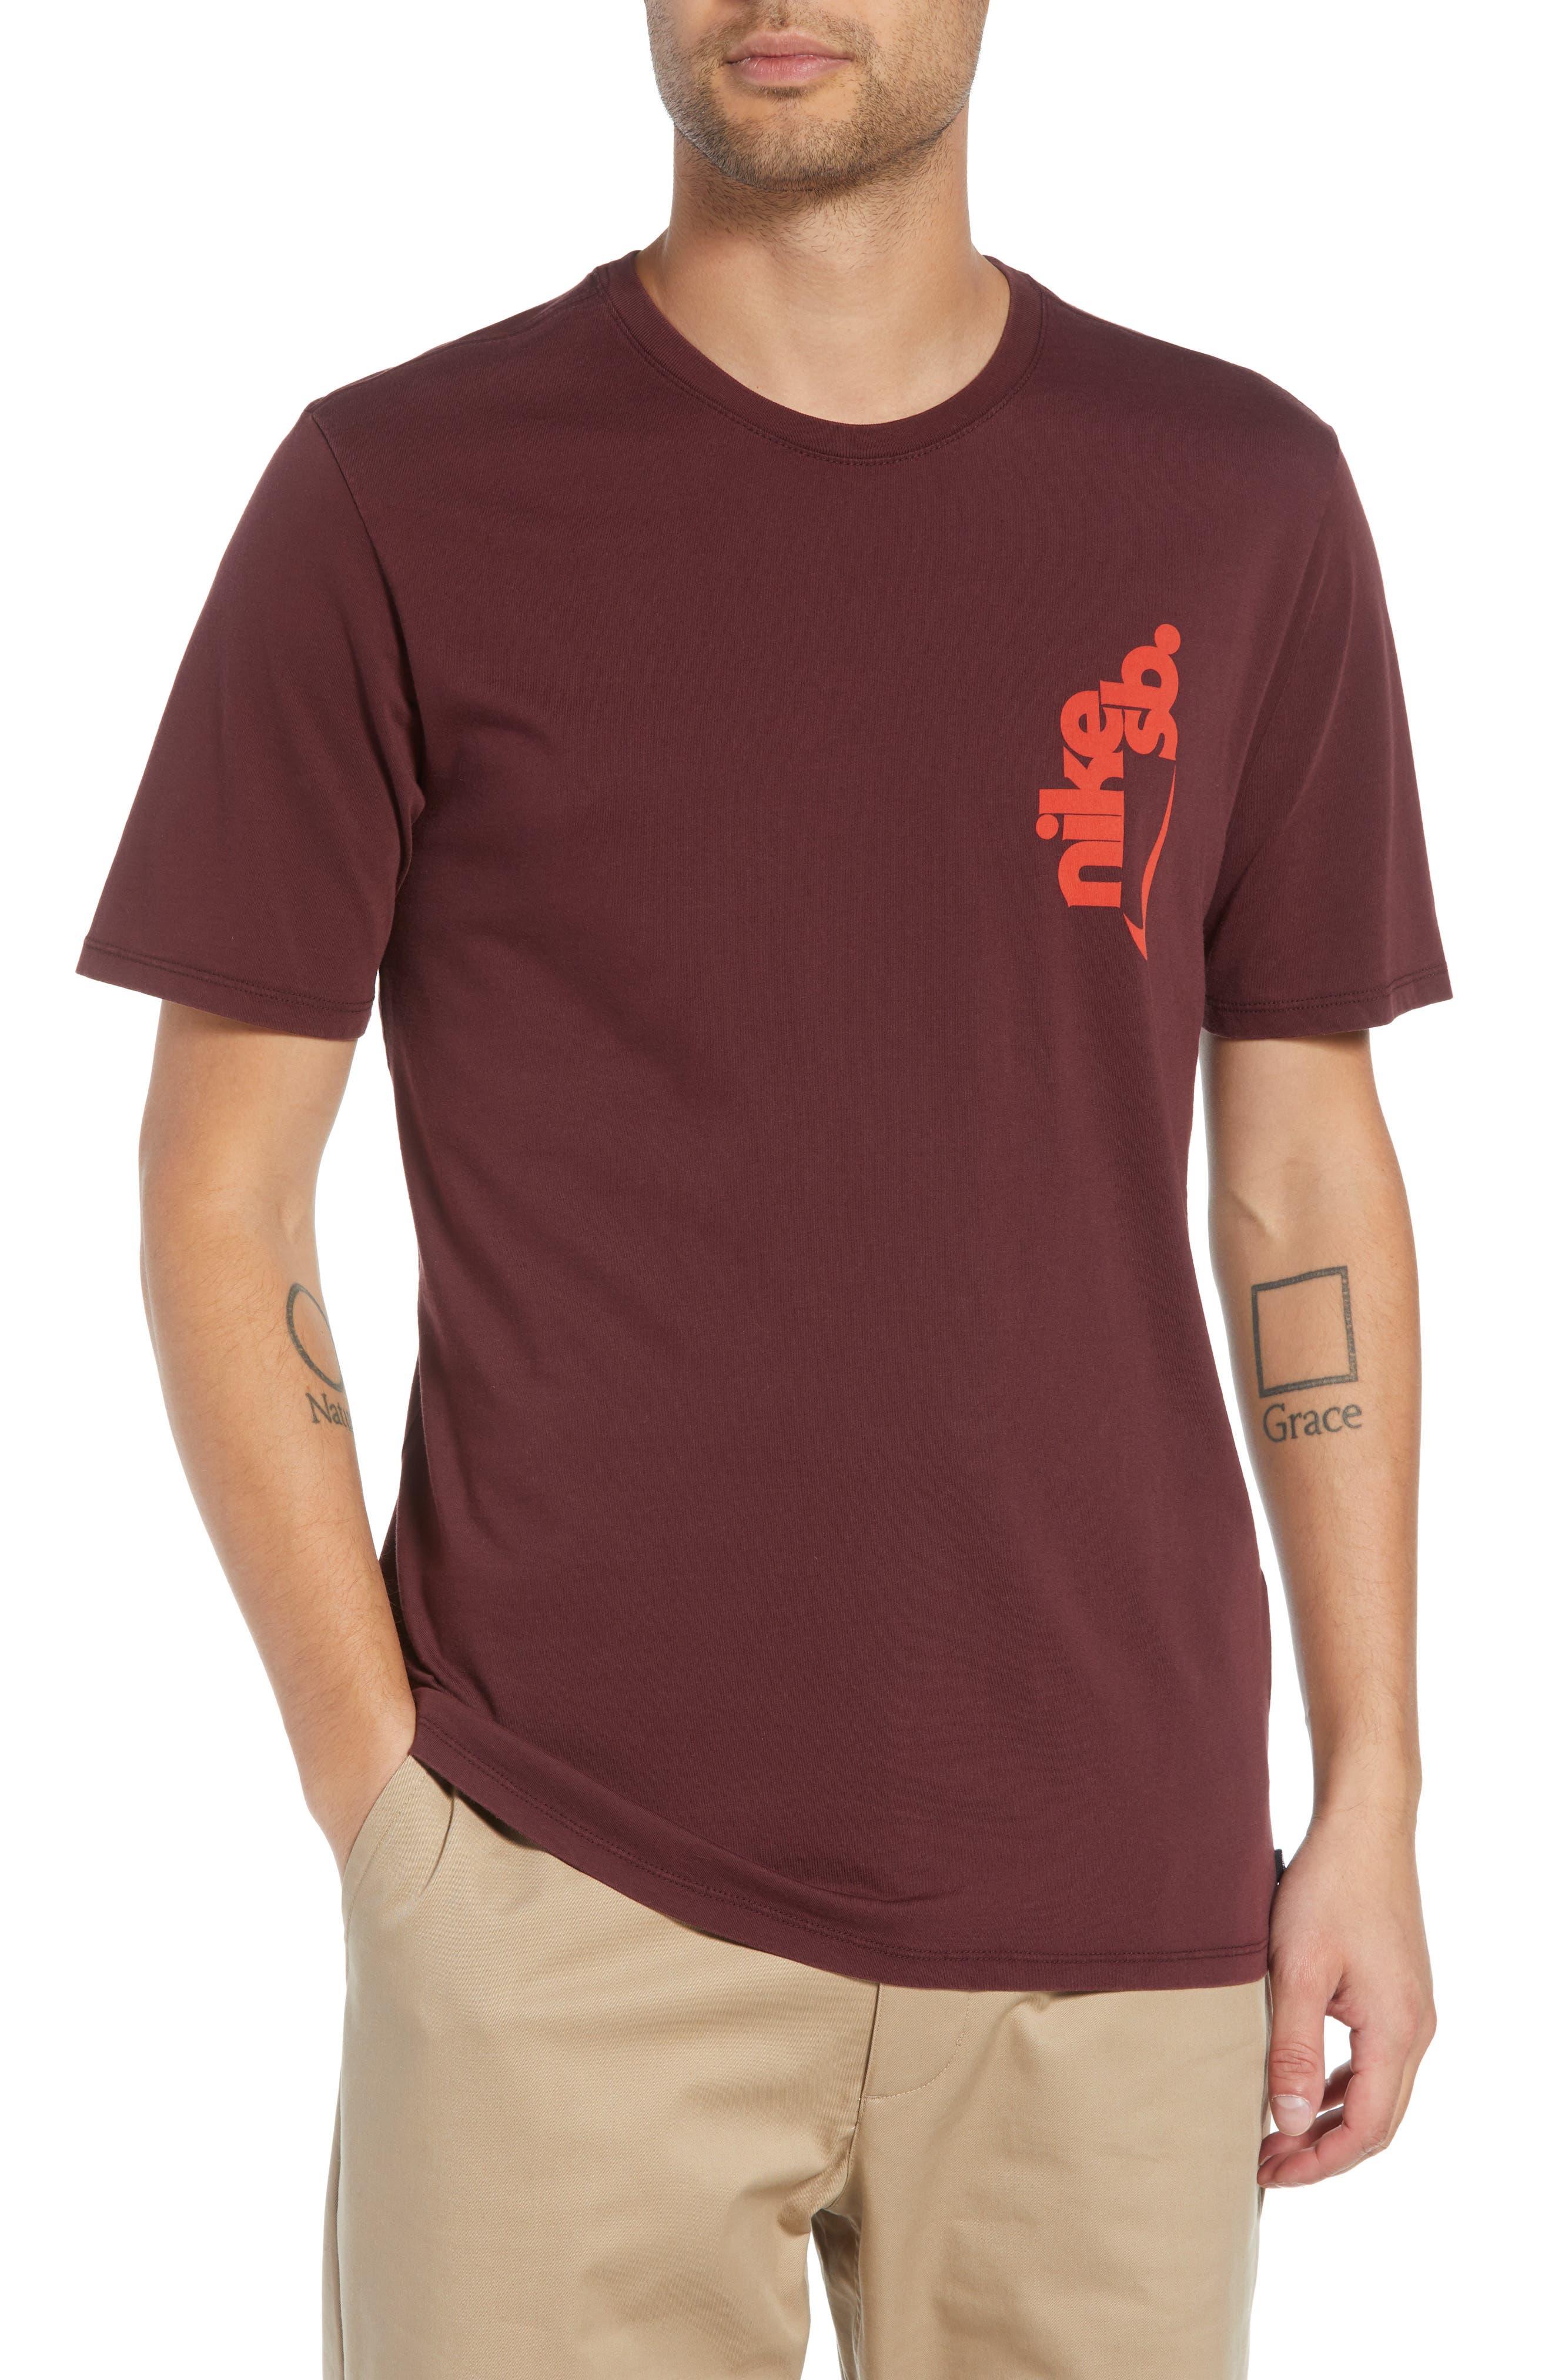 Crewneck T-Shirt,                             Main thumbnail 1, color,                             BURGUNDY CRUSH/ HABANERO RED